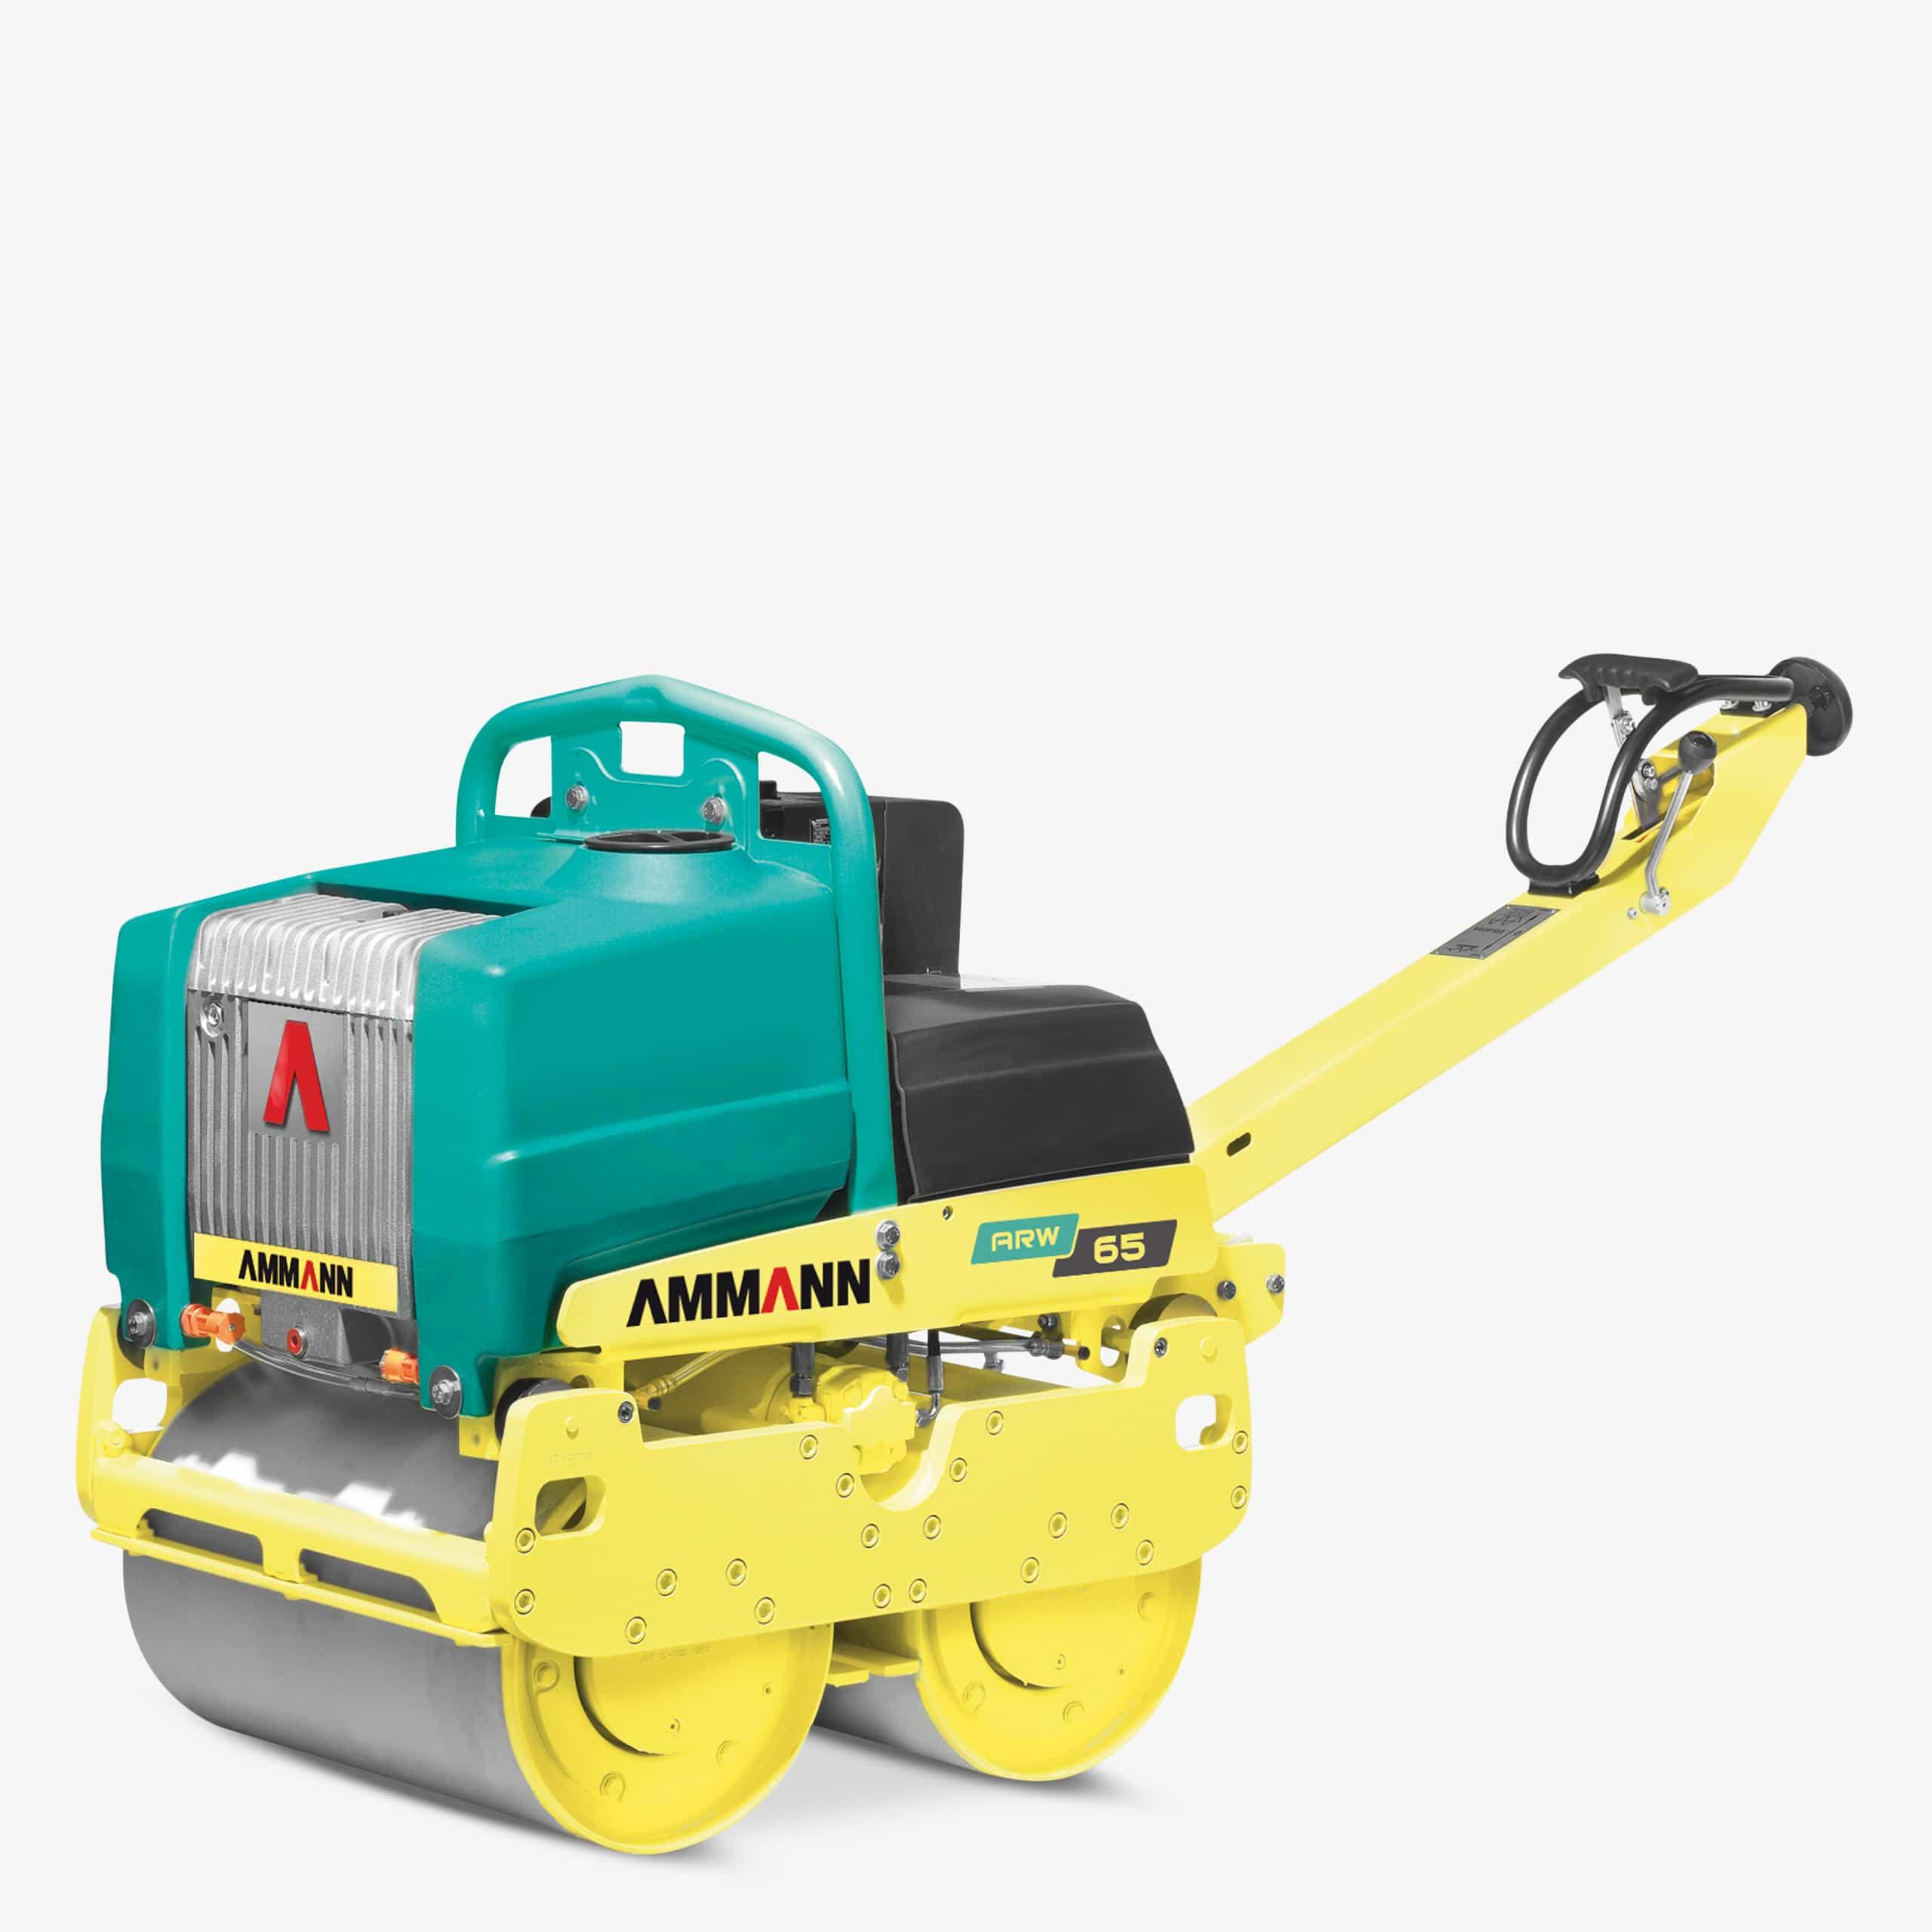 Ammann ARW 65 Handgeführte Vibrationswalze